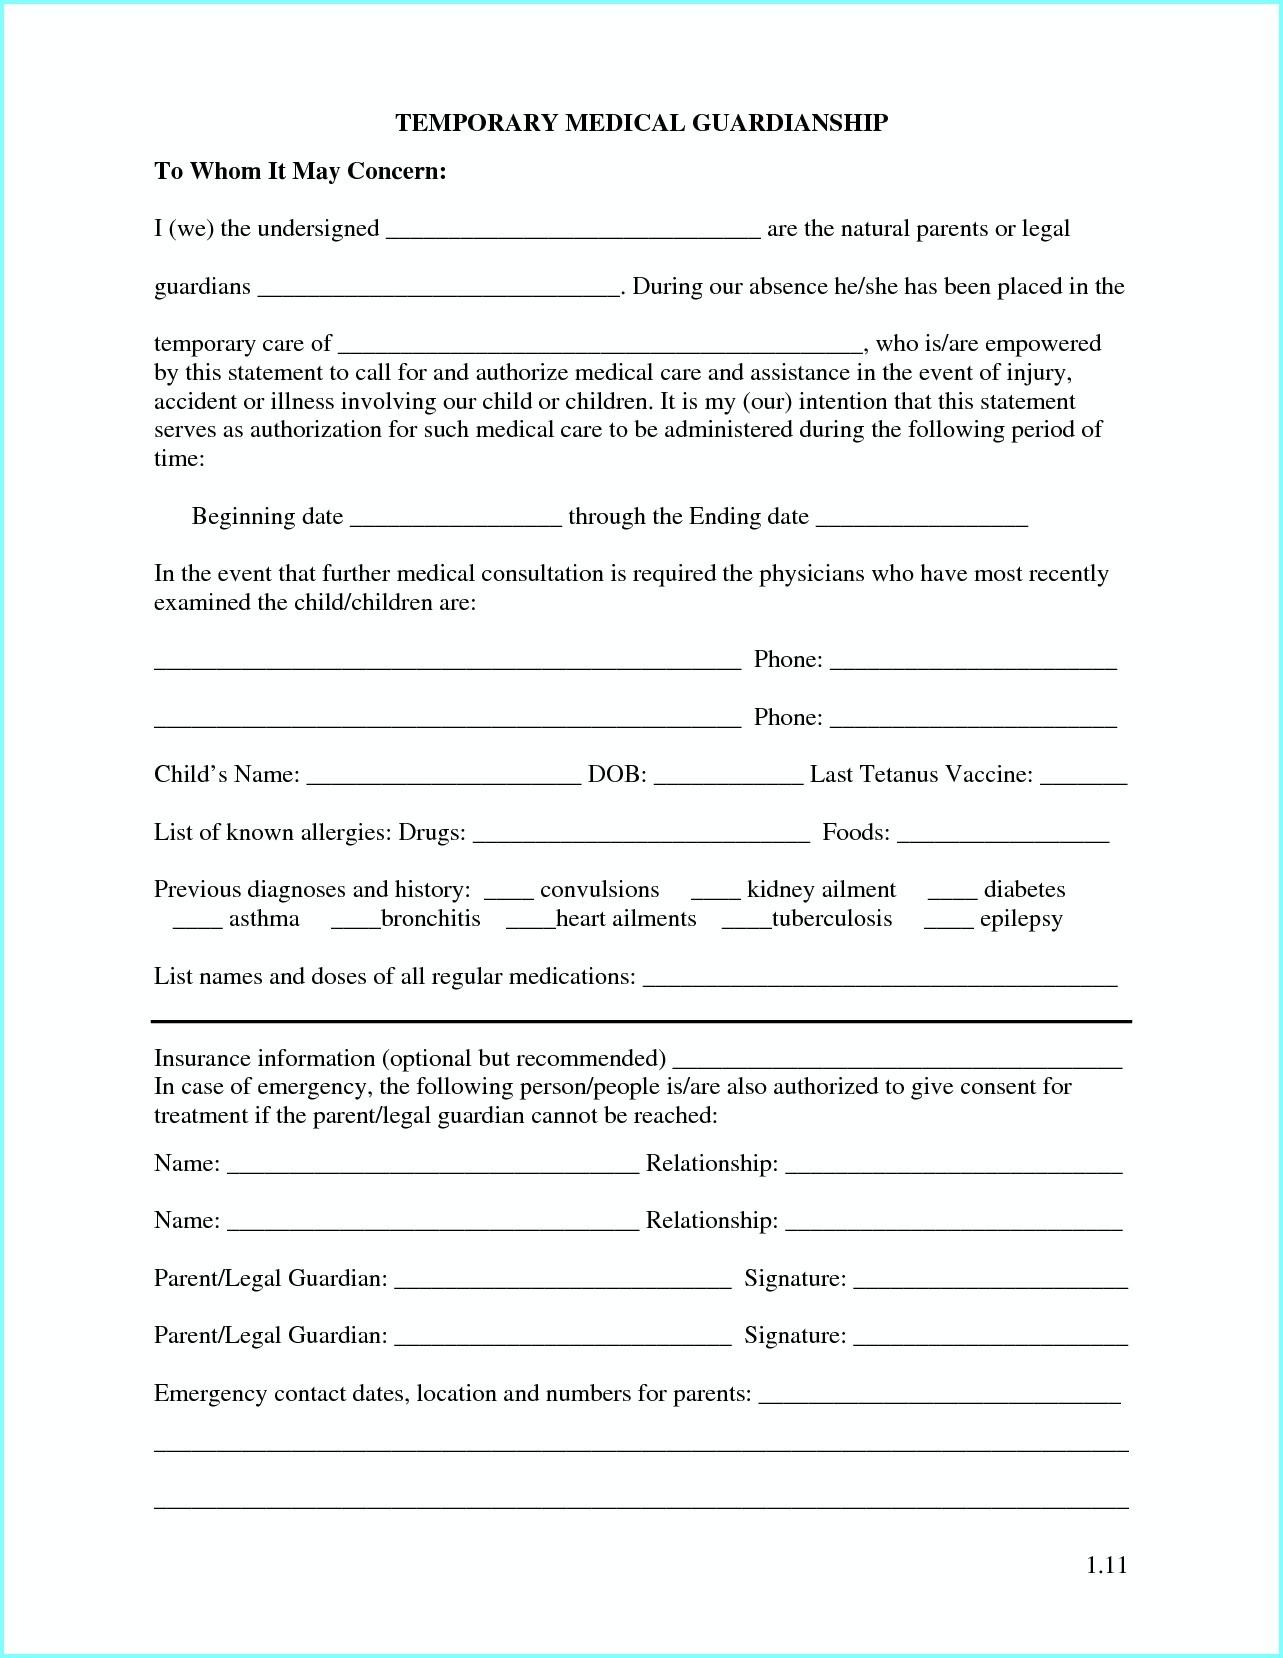 Free Printable Temporary Guardianship Forms - Form : Resume Examples - Free Printable Guardianship Forms Texas